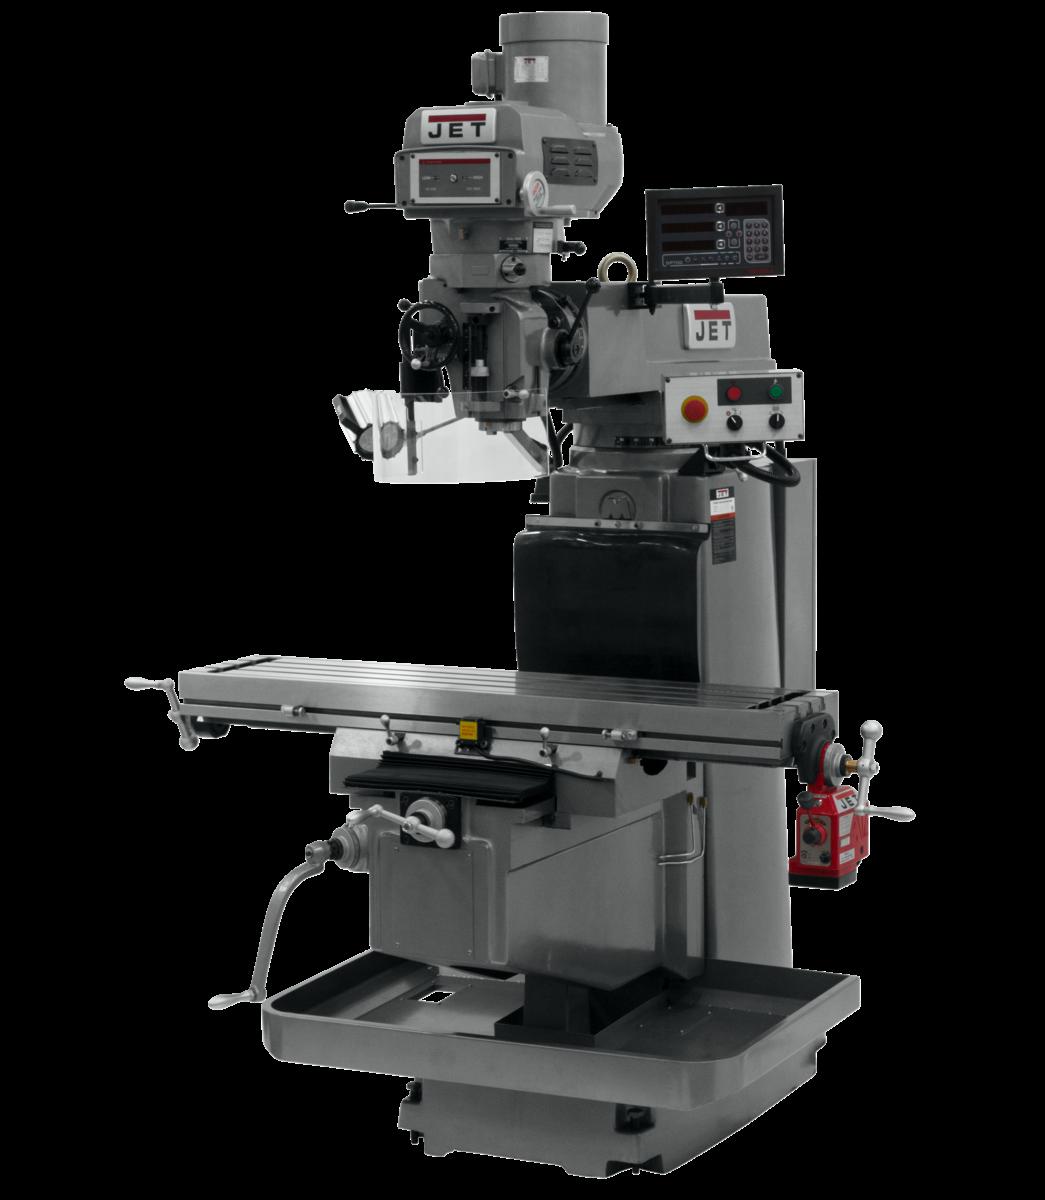 JTM-1254VS with NEWALL DP700 DRO & X Powerfeed